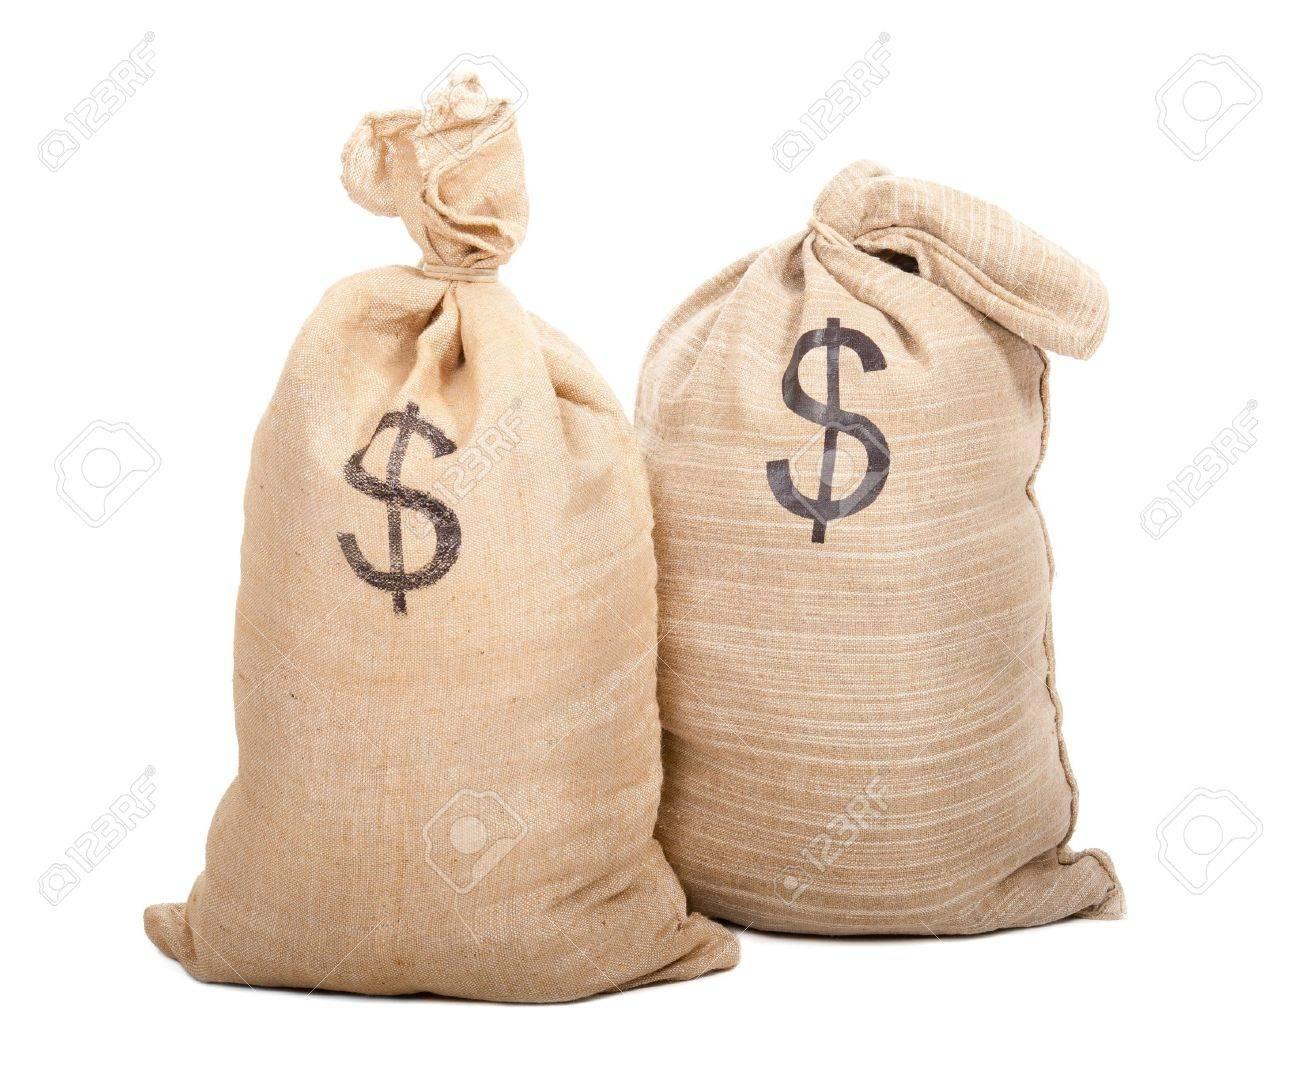 Two sacks full of dollars isolated on white background - 10406282